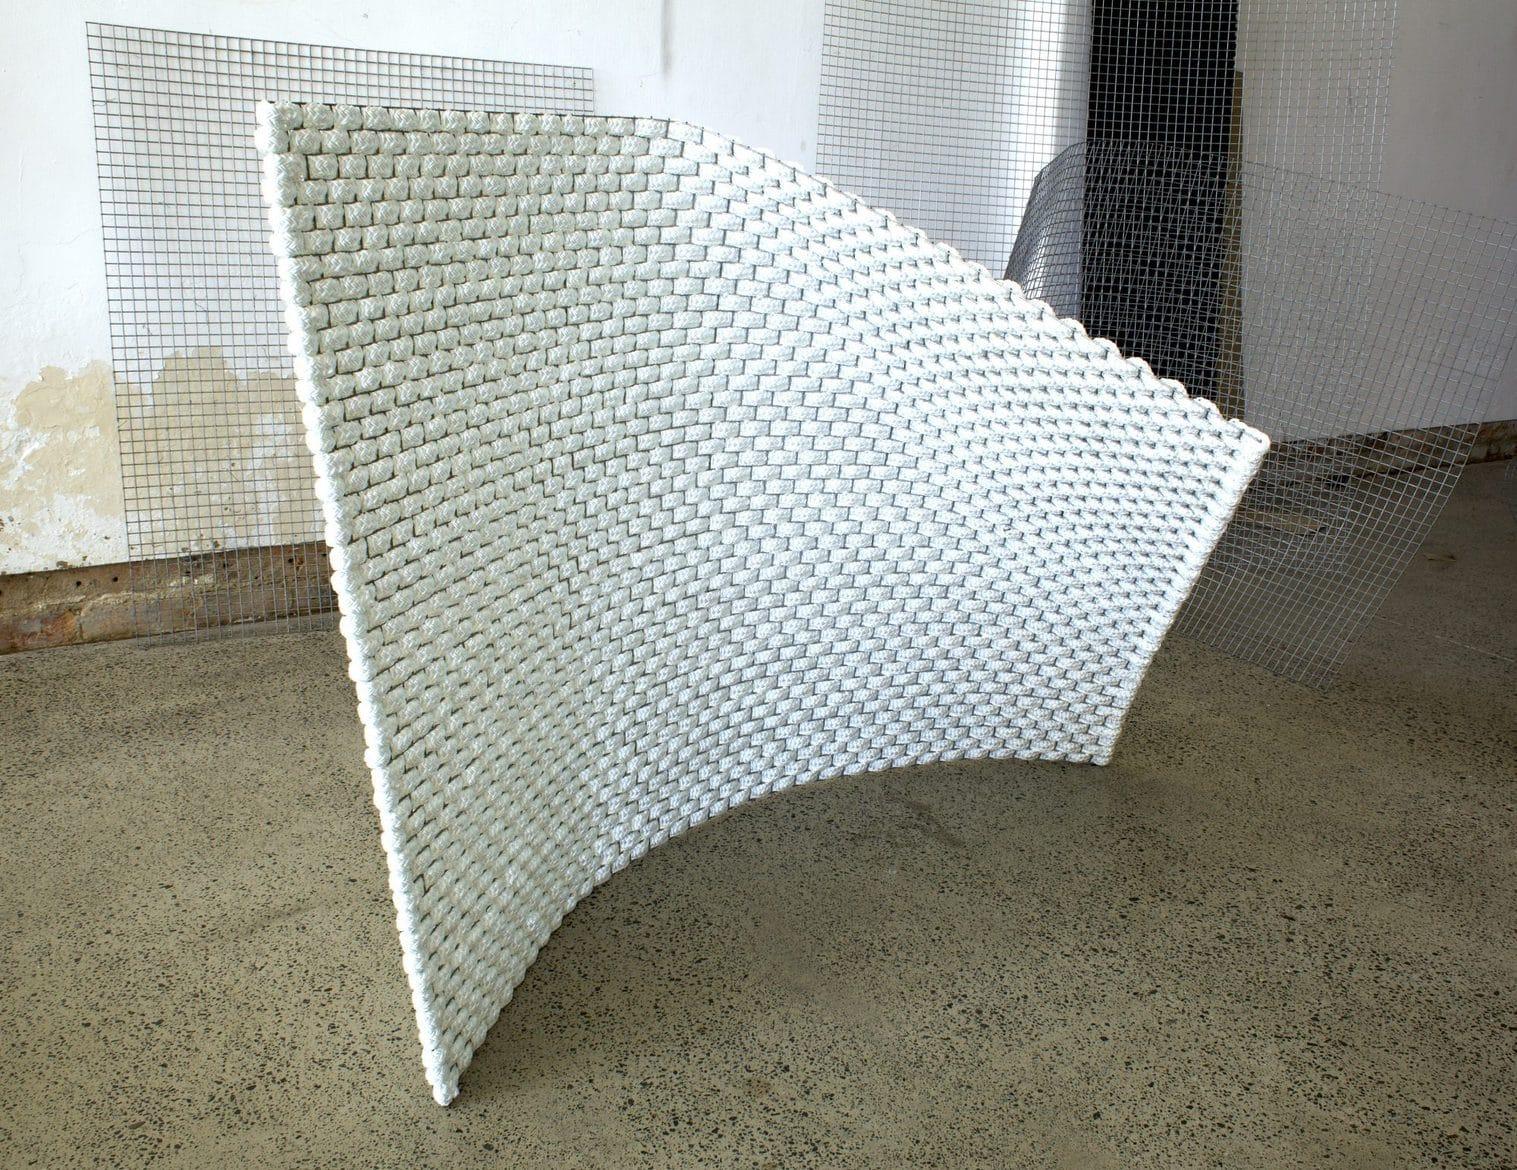 Fold, 2019, Polypropylene and steel, 160 x 110 x 120cm, POA